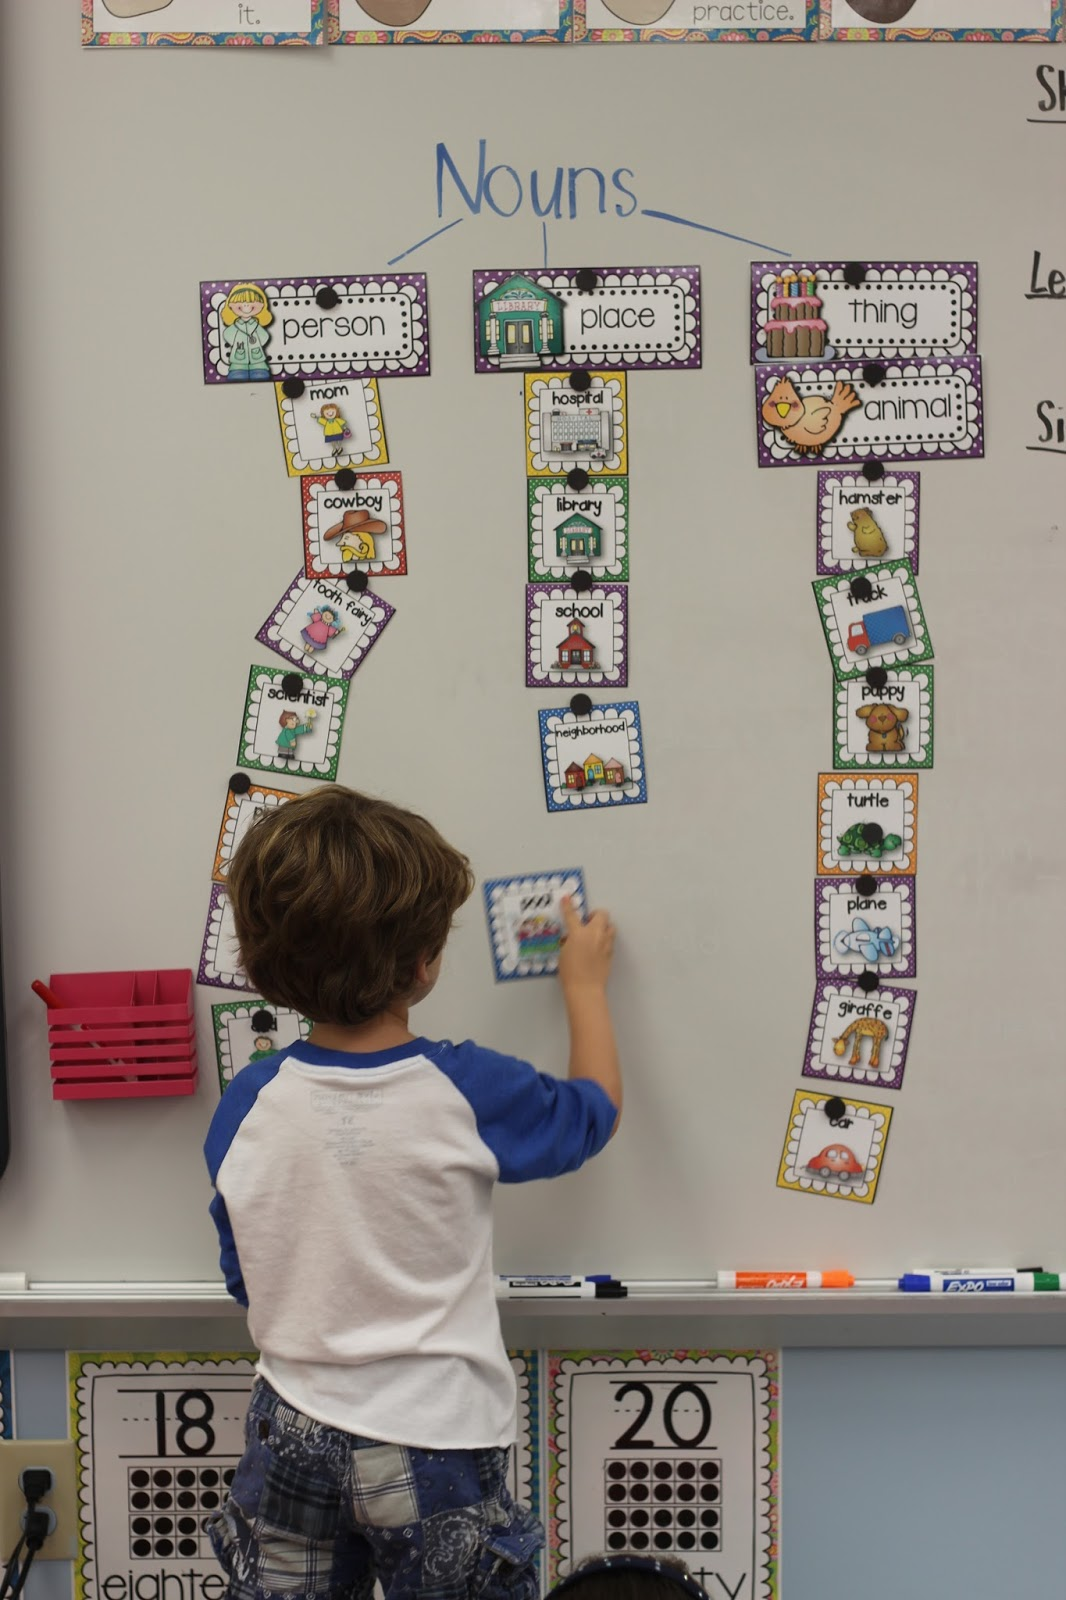 Kinder Garden: Teaching Nouns In Kindergarten